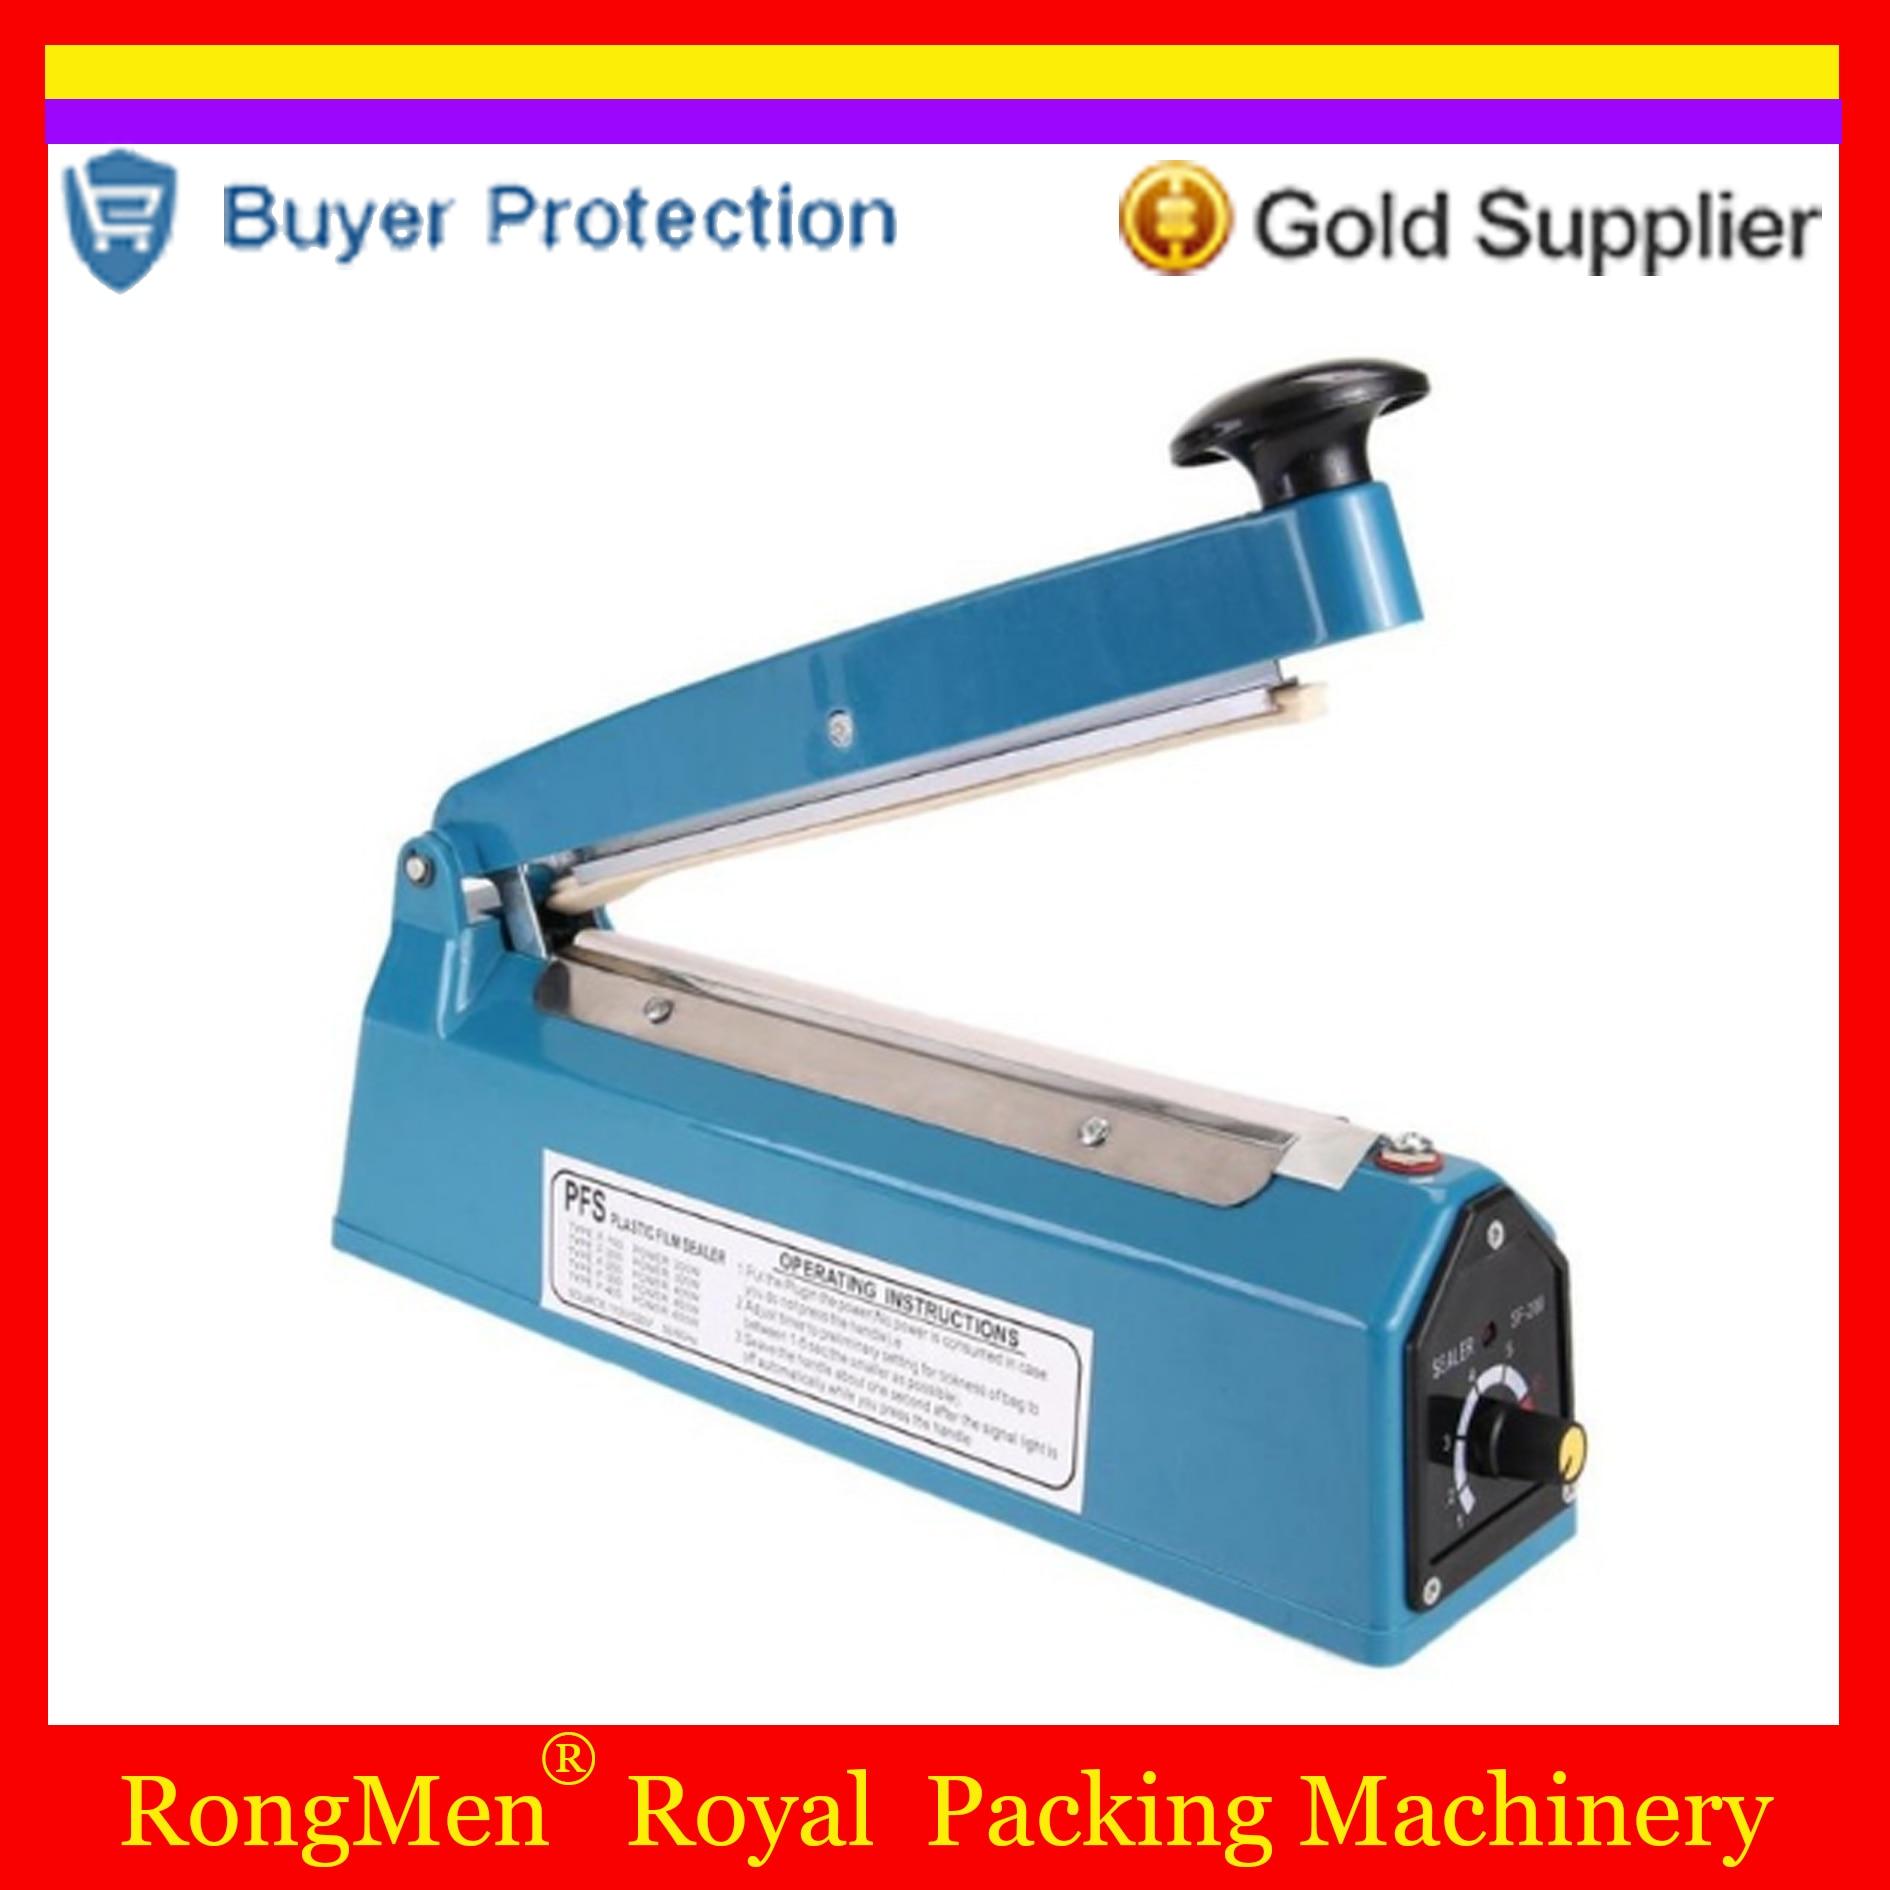 20mm plastic bag sealer film impulse sealer,manual impulse sealing machine,aluminum bag Impulse Heat Sealer Electric SF-200 Бутылка